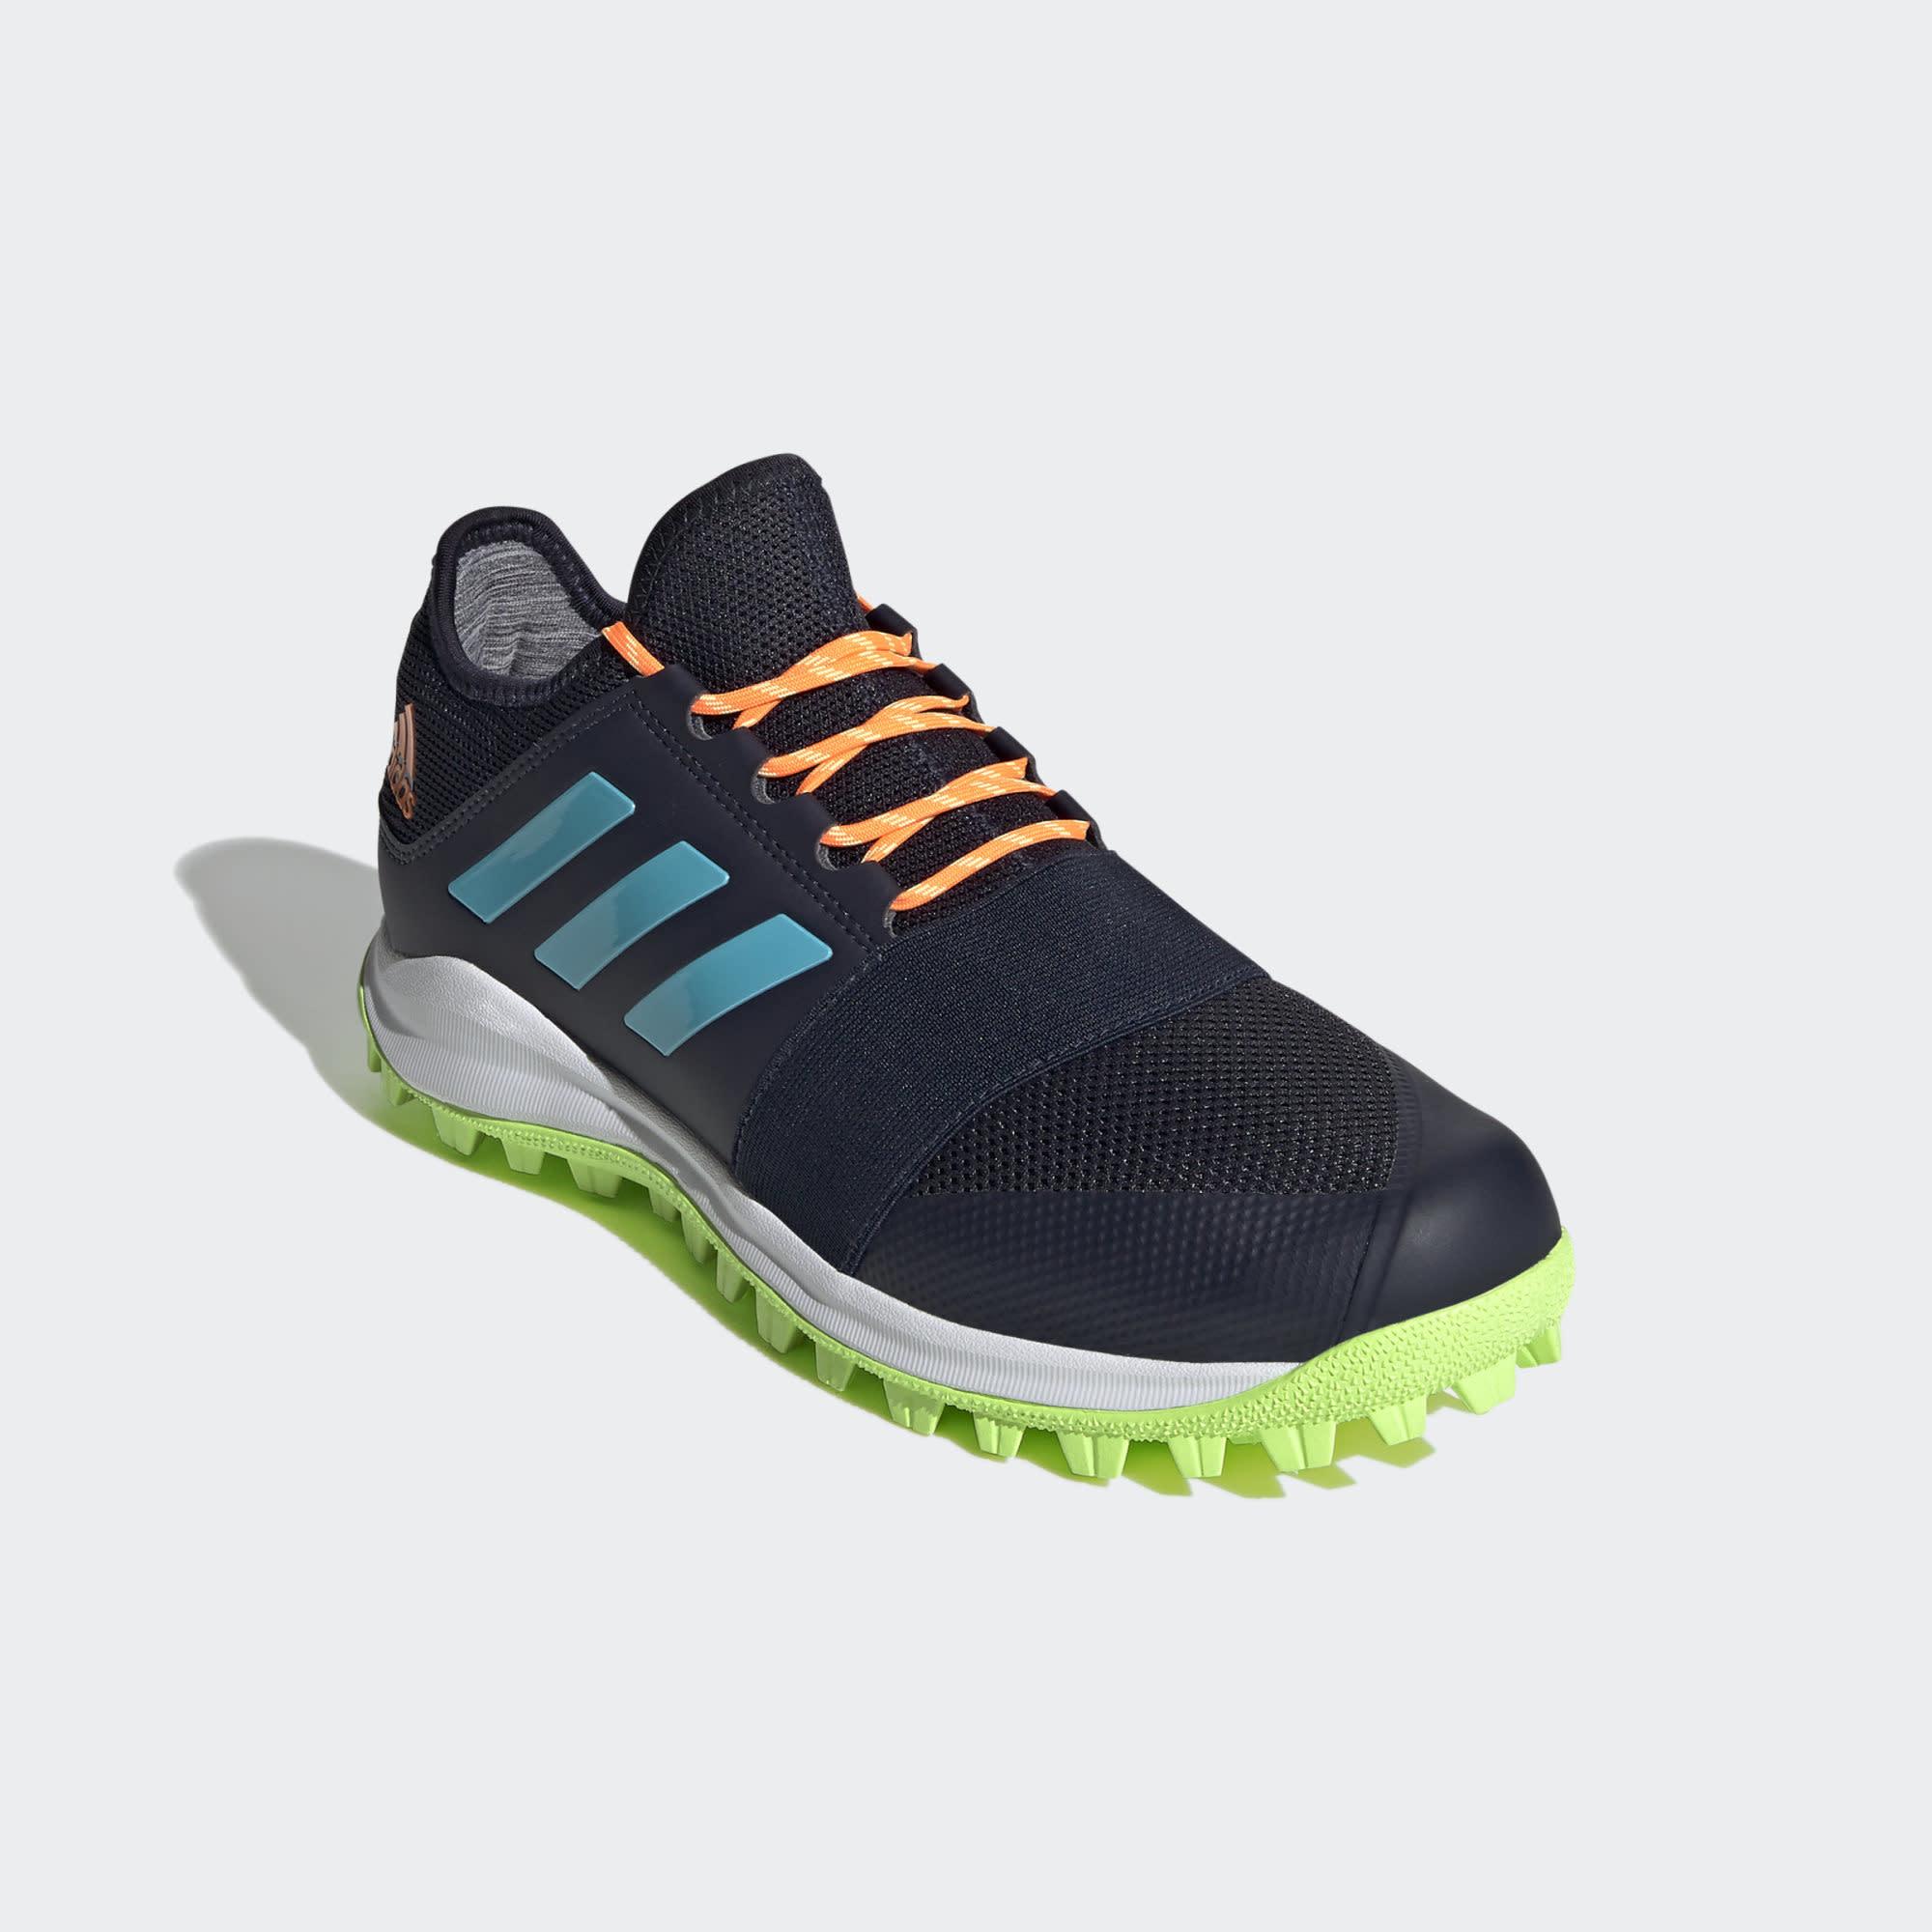 Adidas Divox 1.9S Hockey Shoe (2020) - (Astro)